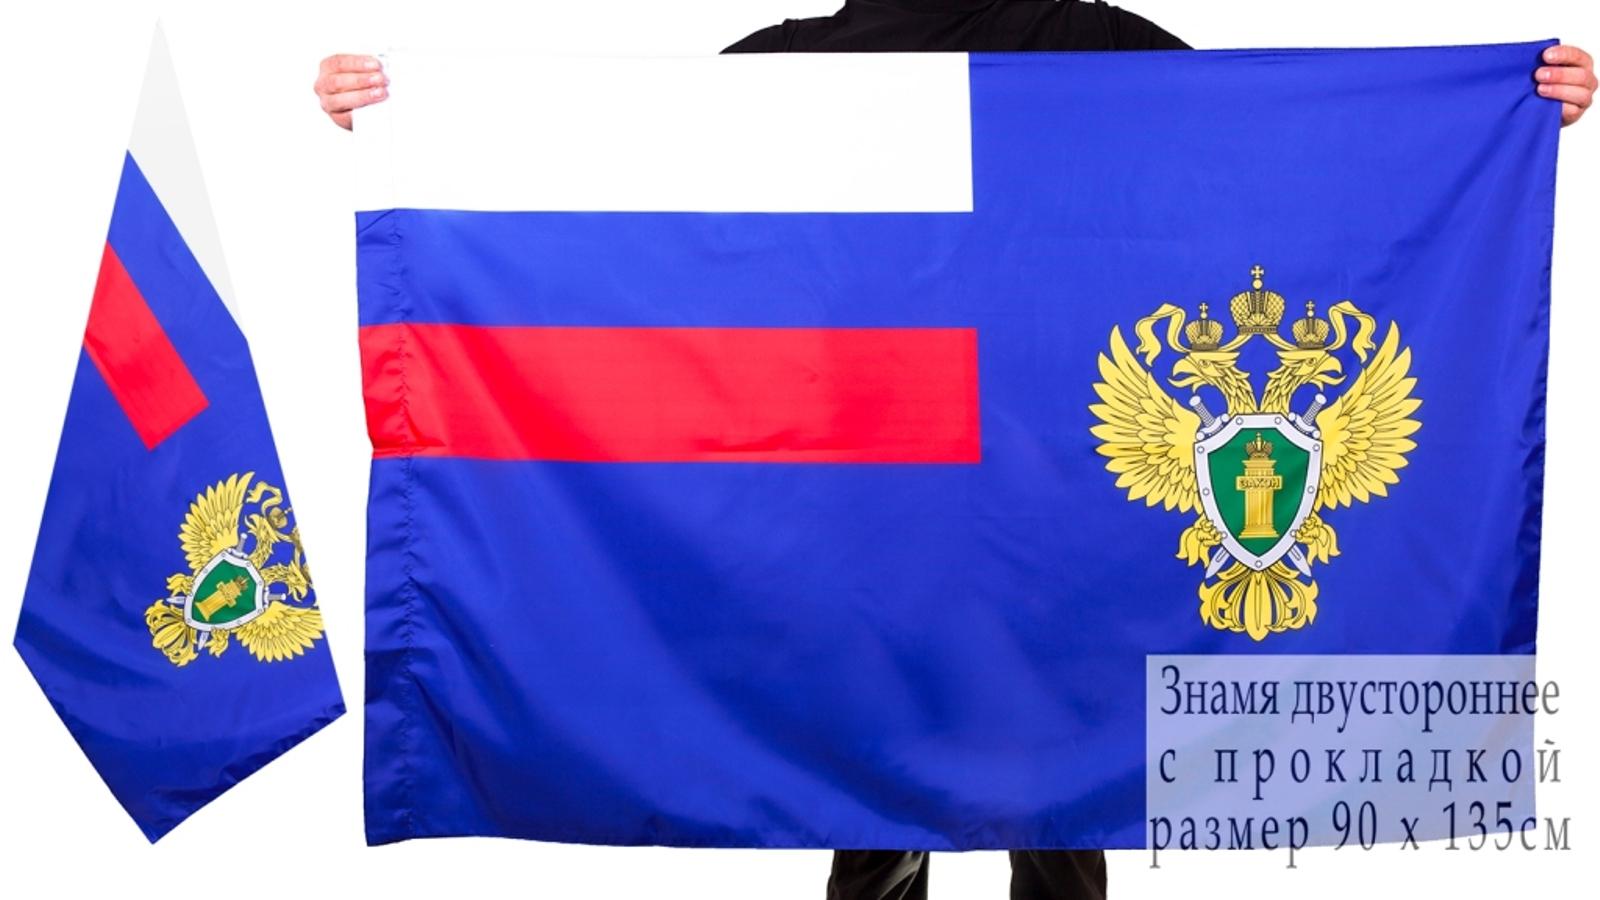 Флаг Прокуратуры России двухсторонний